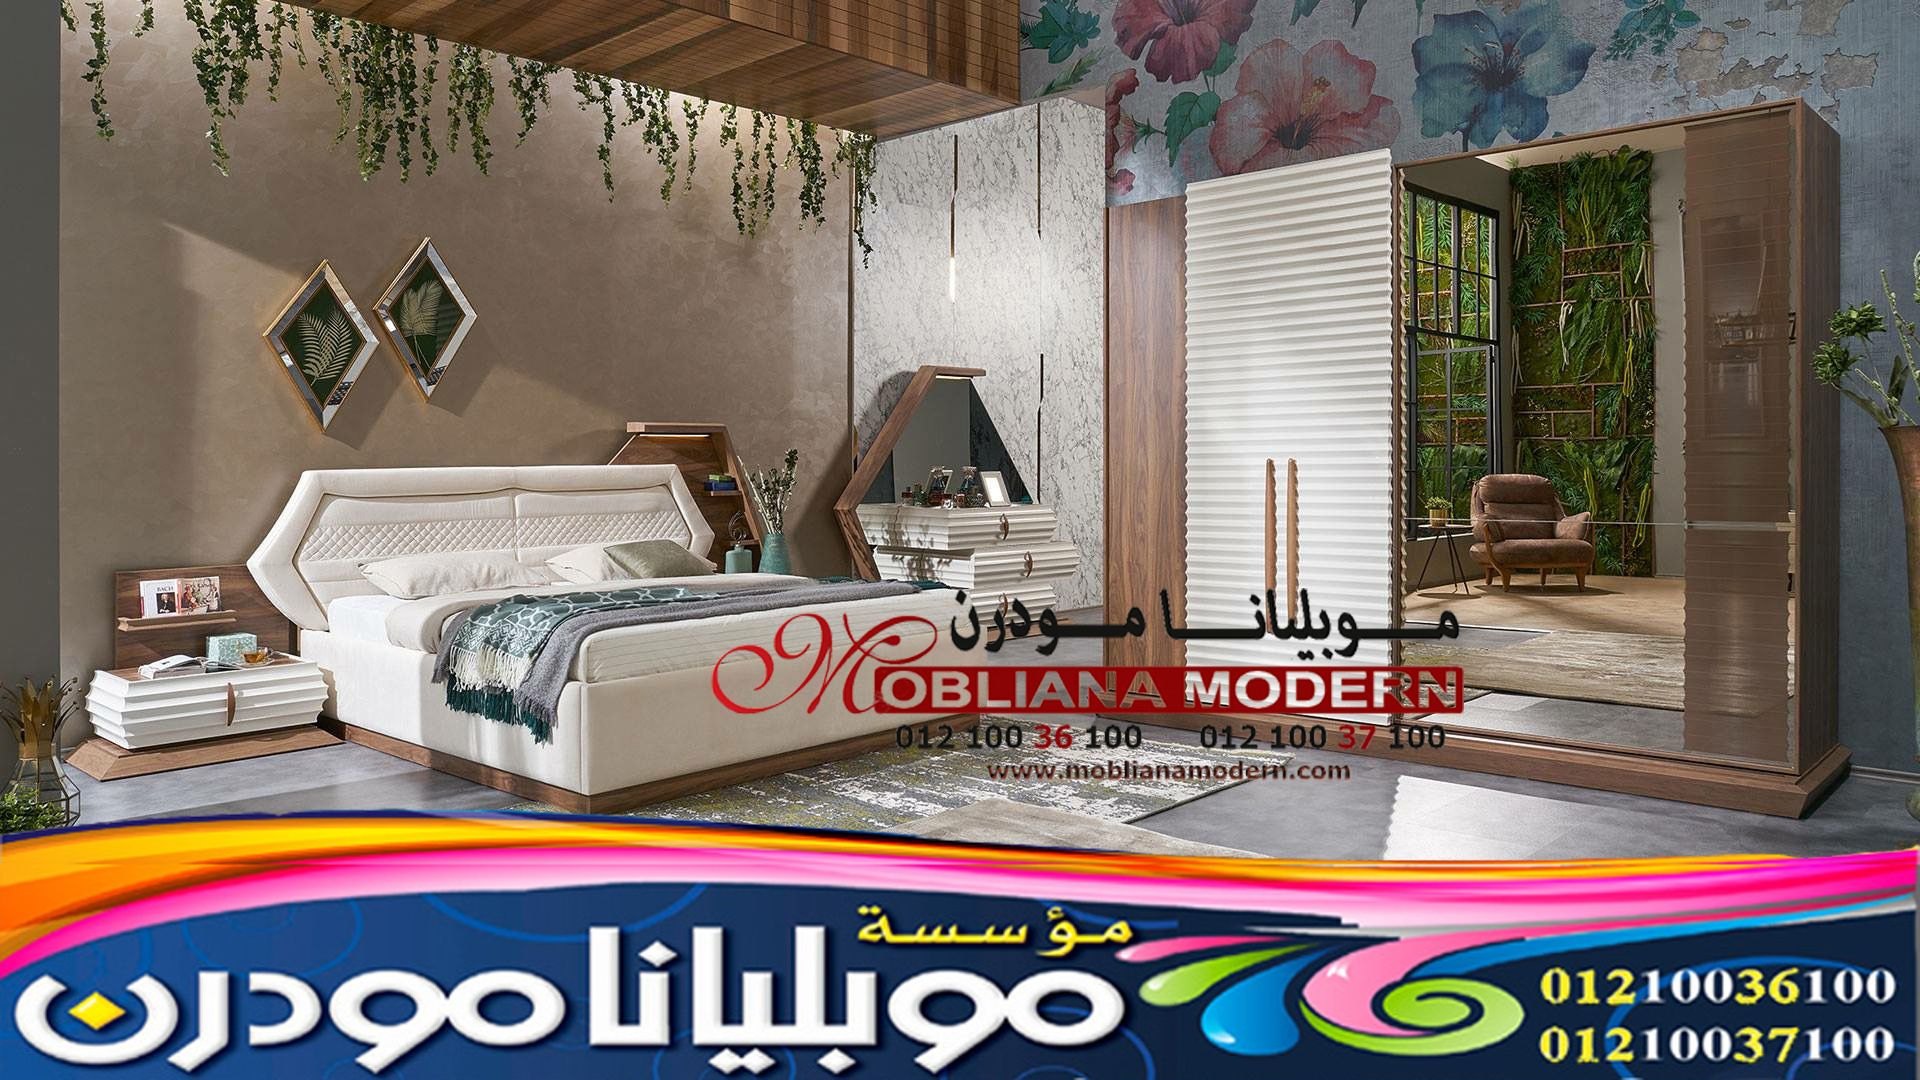 غرف نوم 2022 2023 غرف نوم تركية اوض نوم مودرن اوض نوم ابيض غرف نوم دمياط Bedroom